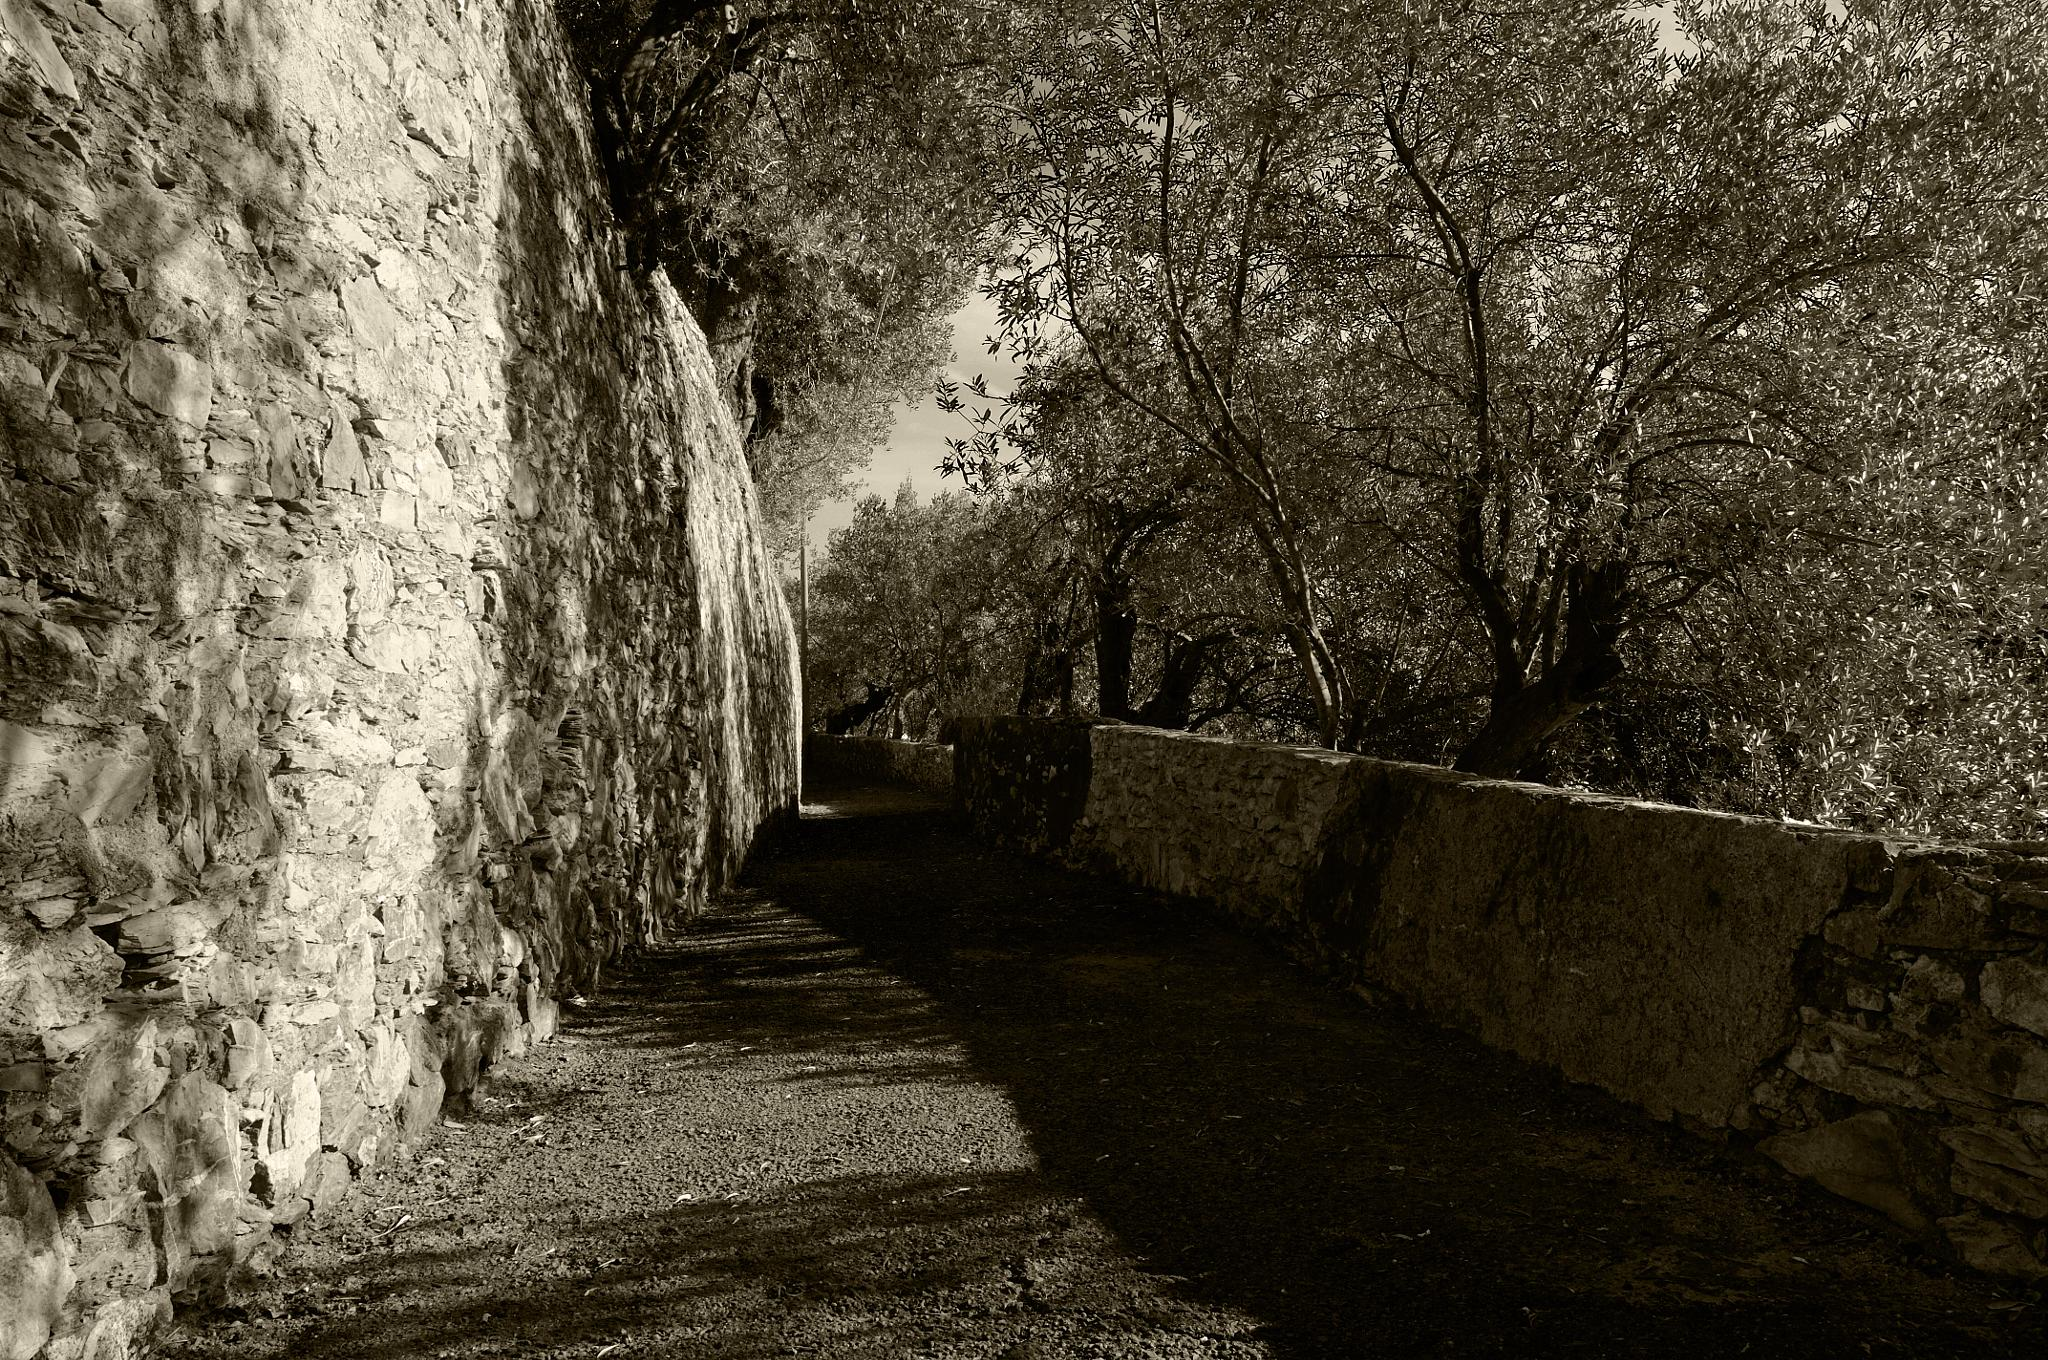 Olive by fabrizio.mantelli.39